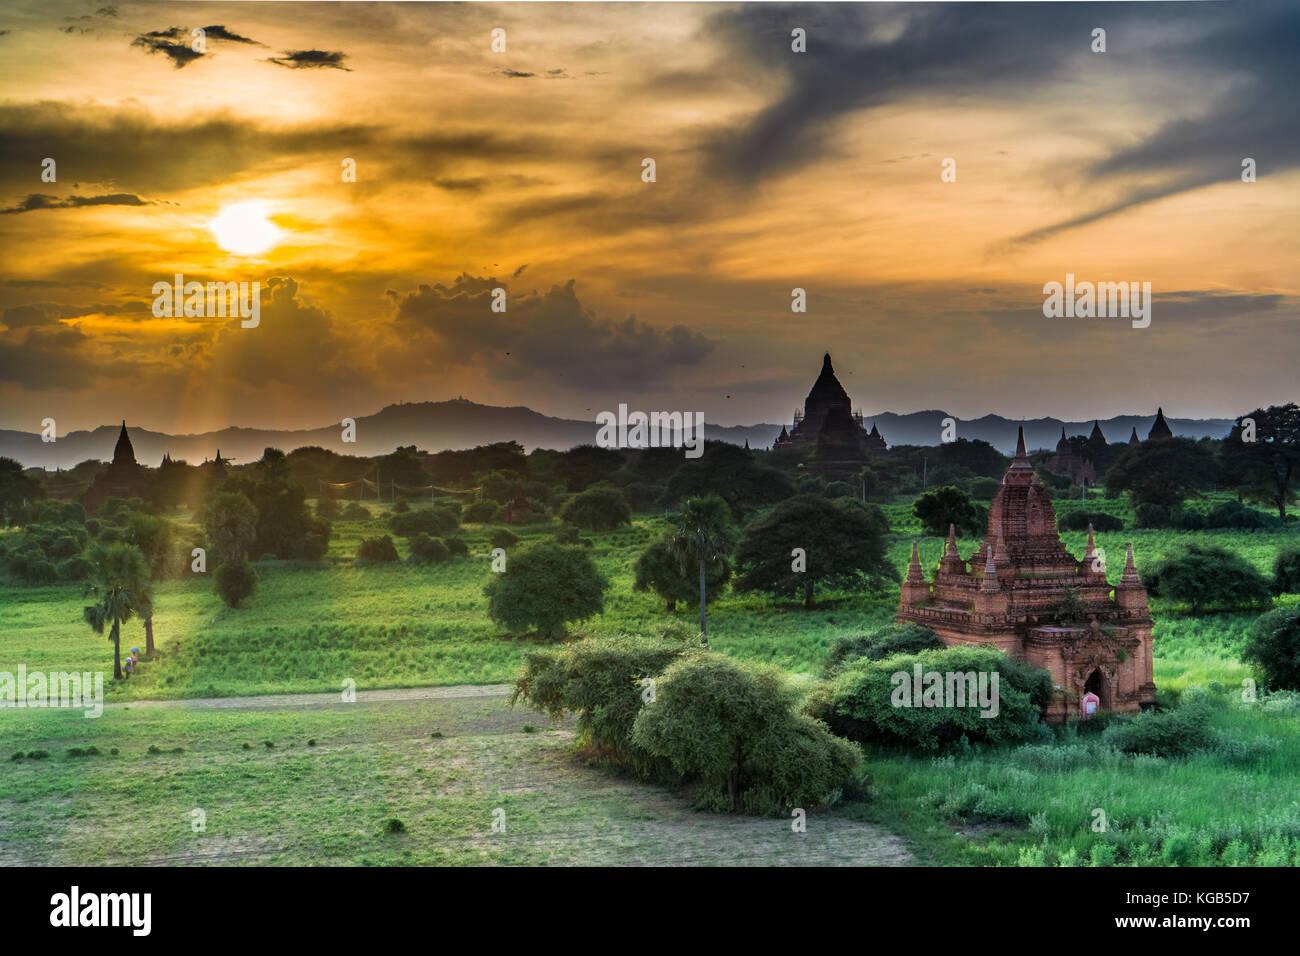 Bagan, Myanmar Pagodas (Temples) - Stock Image